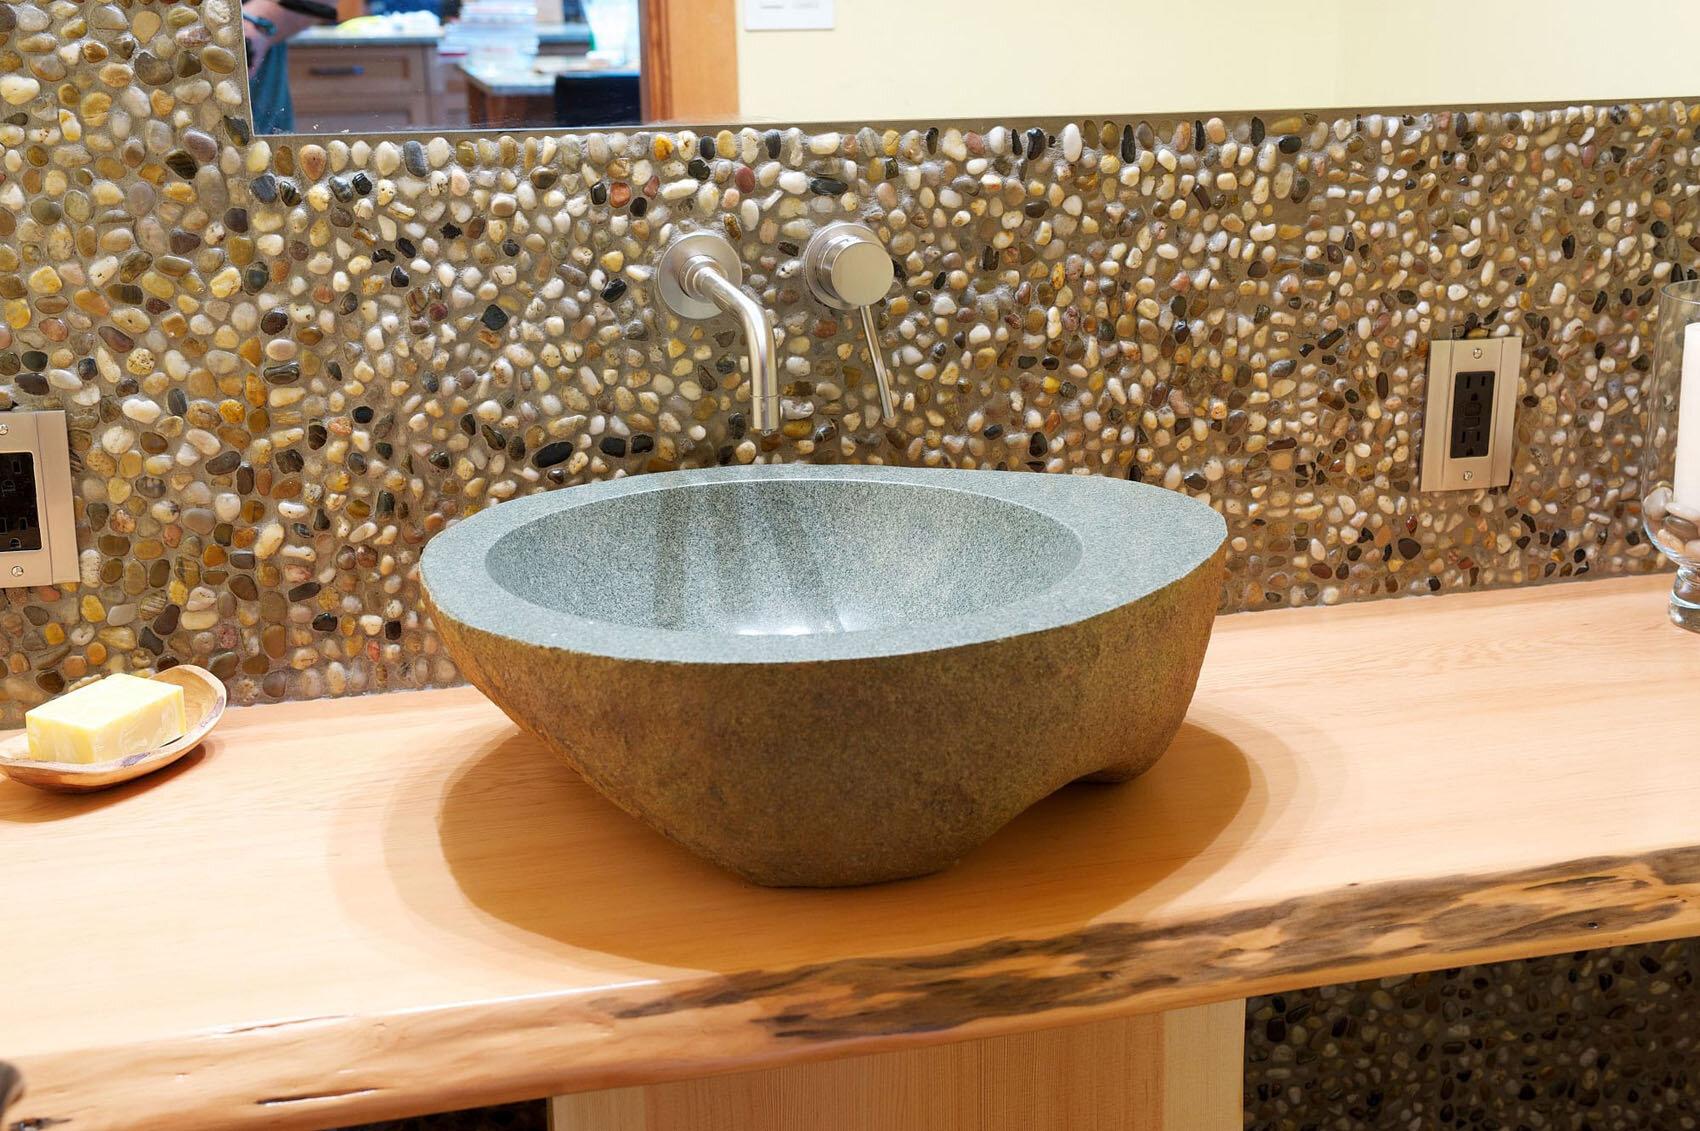 wsi-imageoptim-Stone-sink-tile-Whistler-bath.jpg